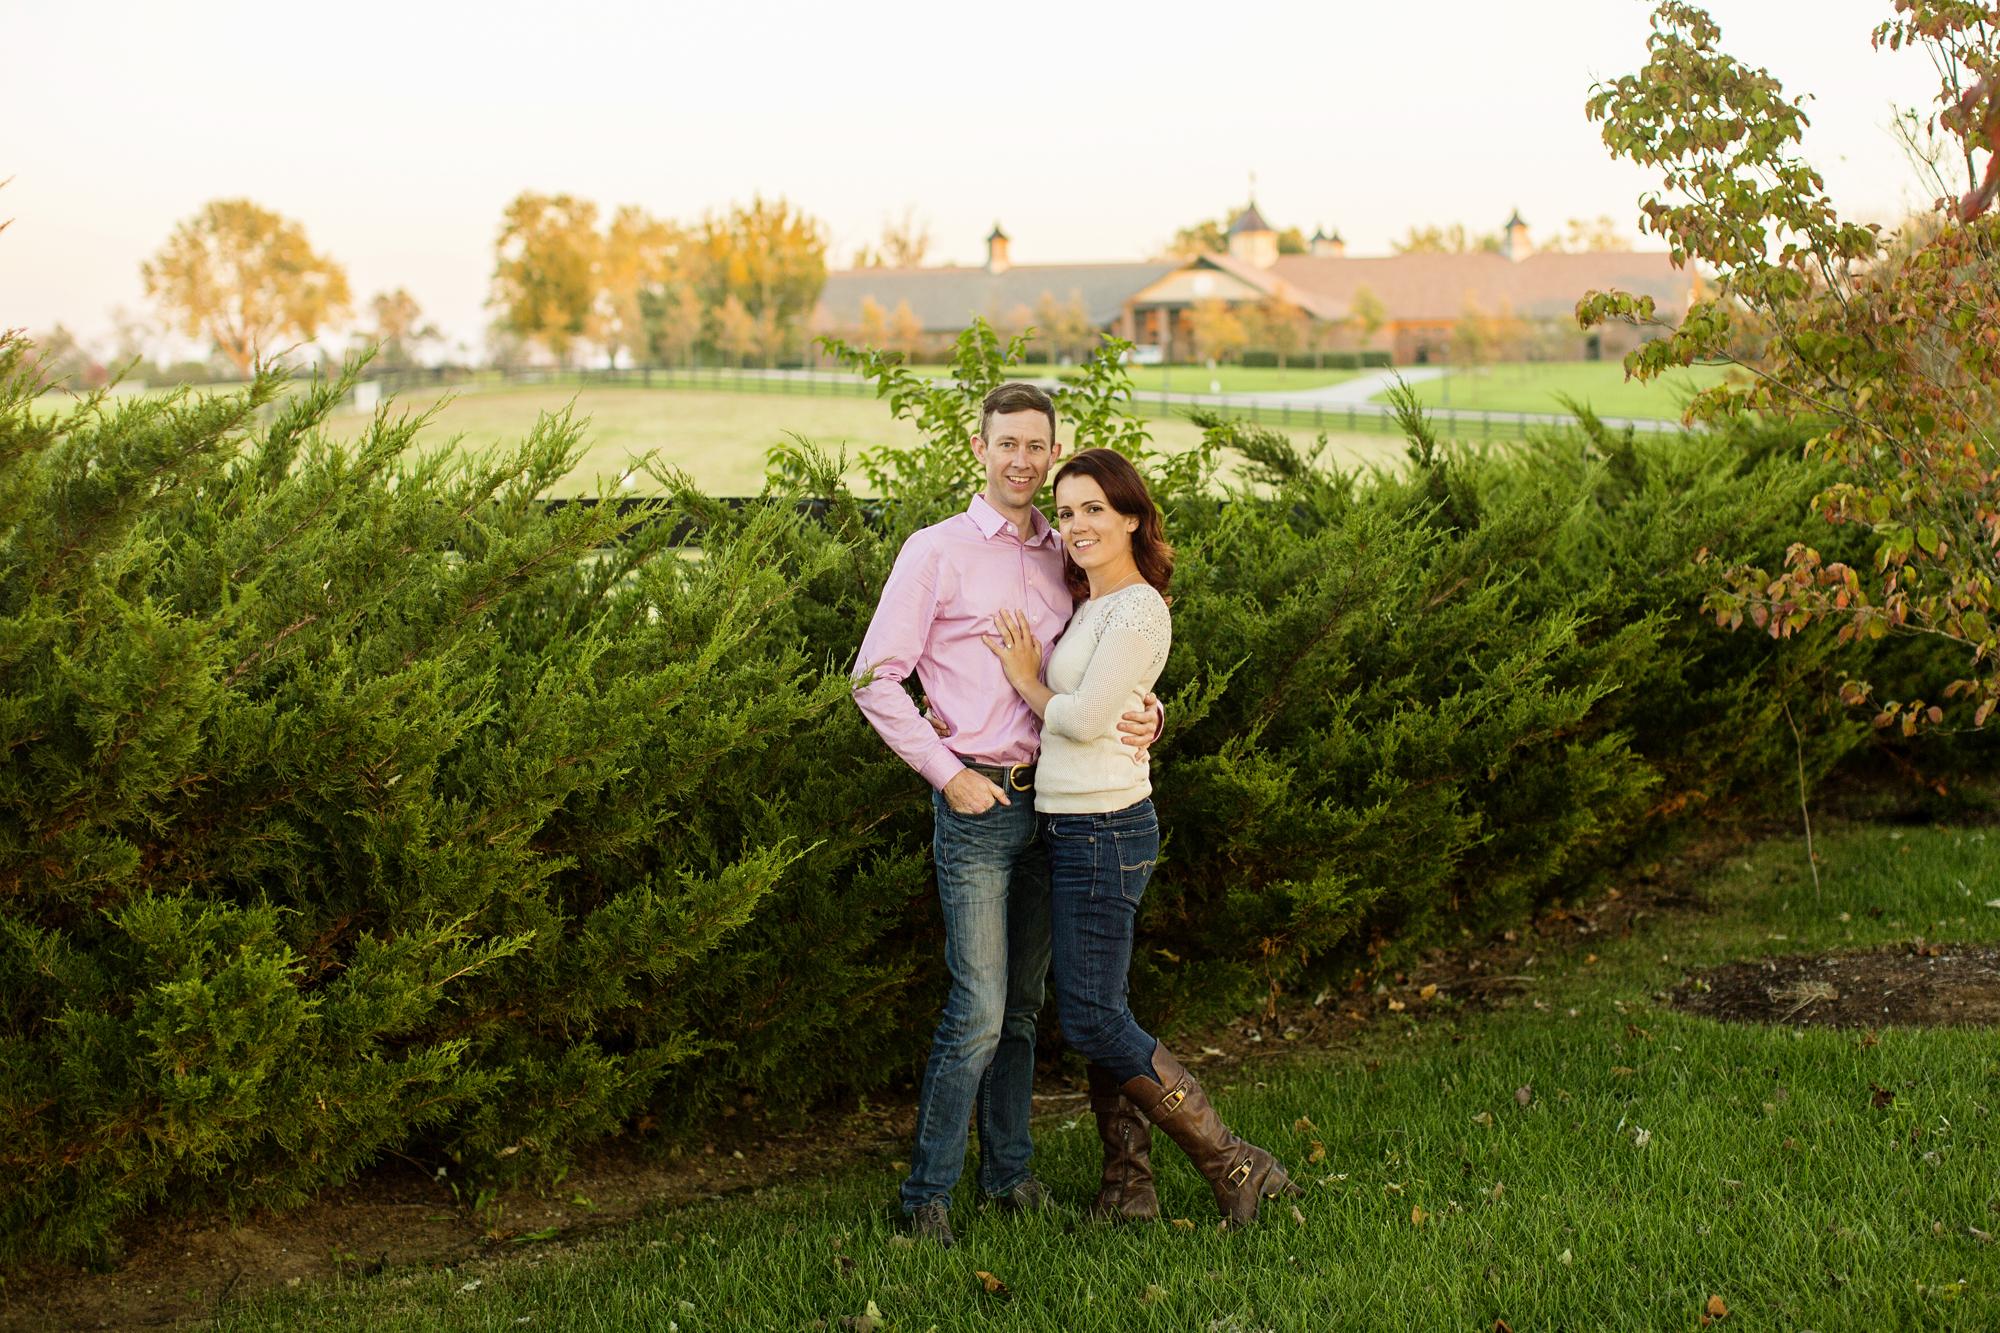 Seriously_Sabrina_Photography_Lexington_Kentucky_Burl_Winstar_Farm_Engagement_AliJerry_38.jpg